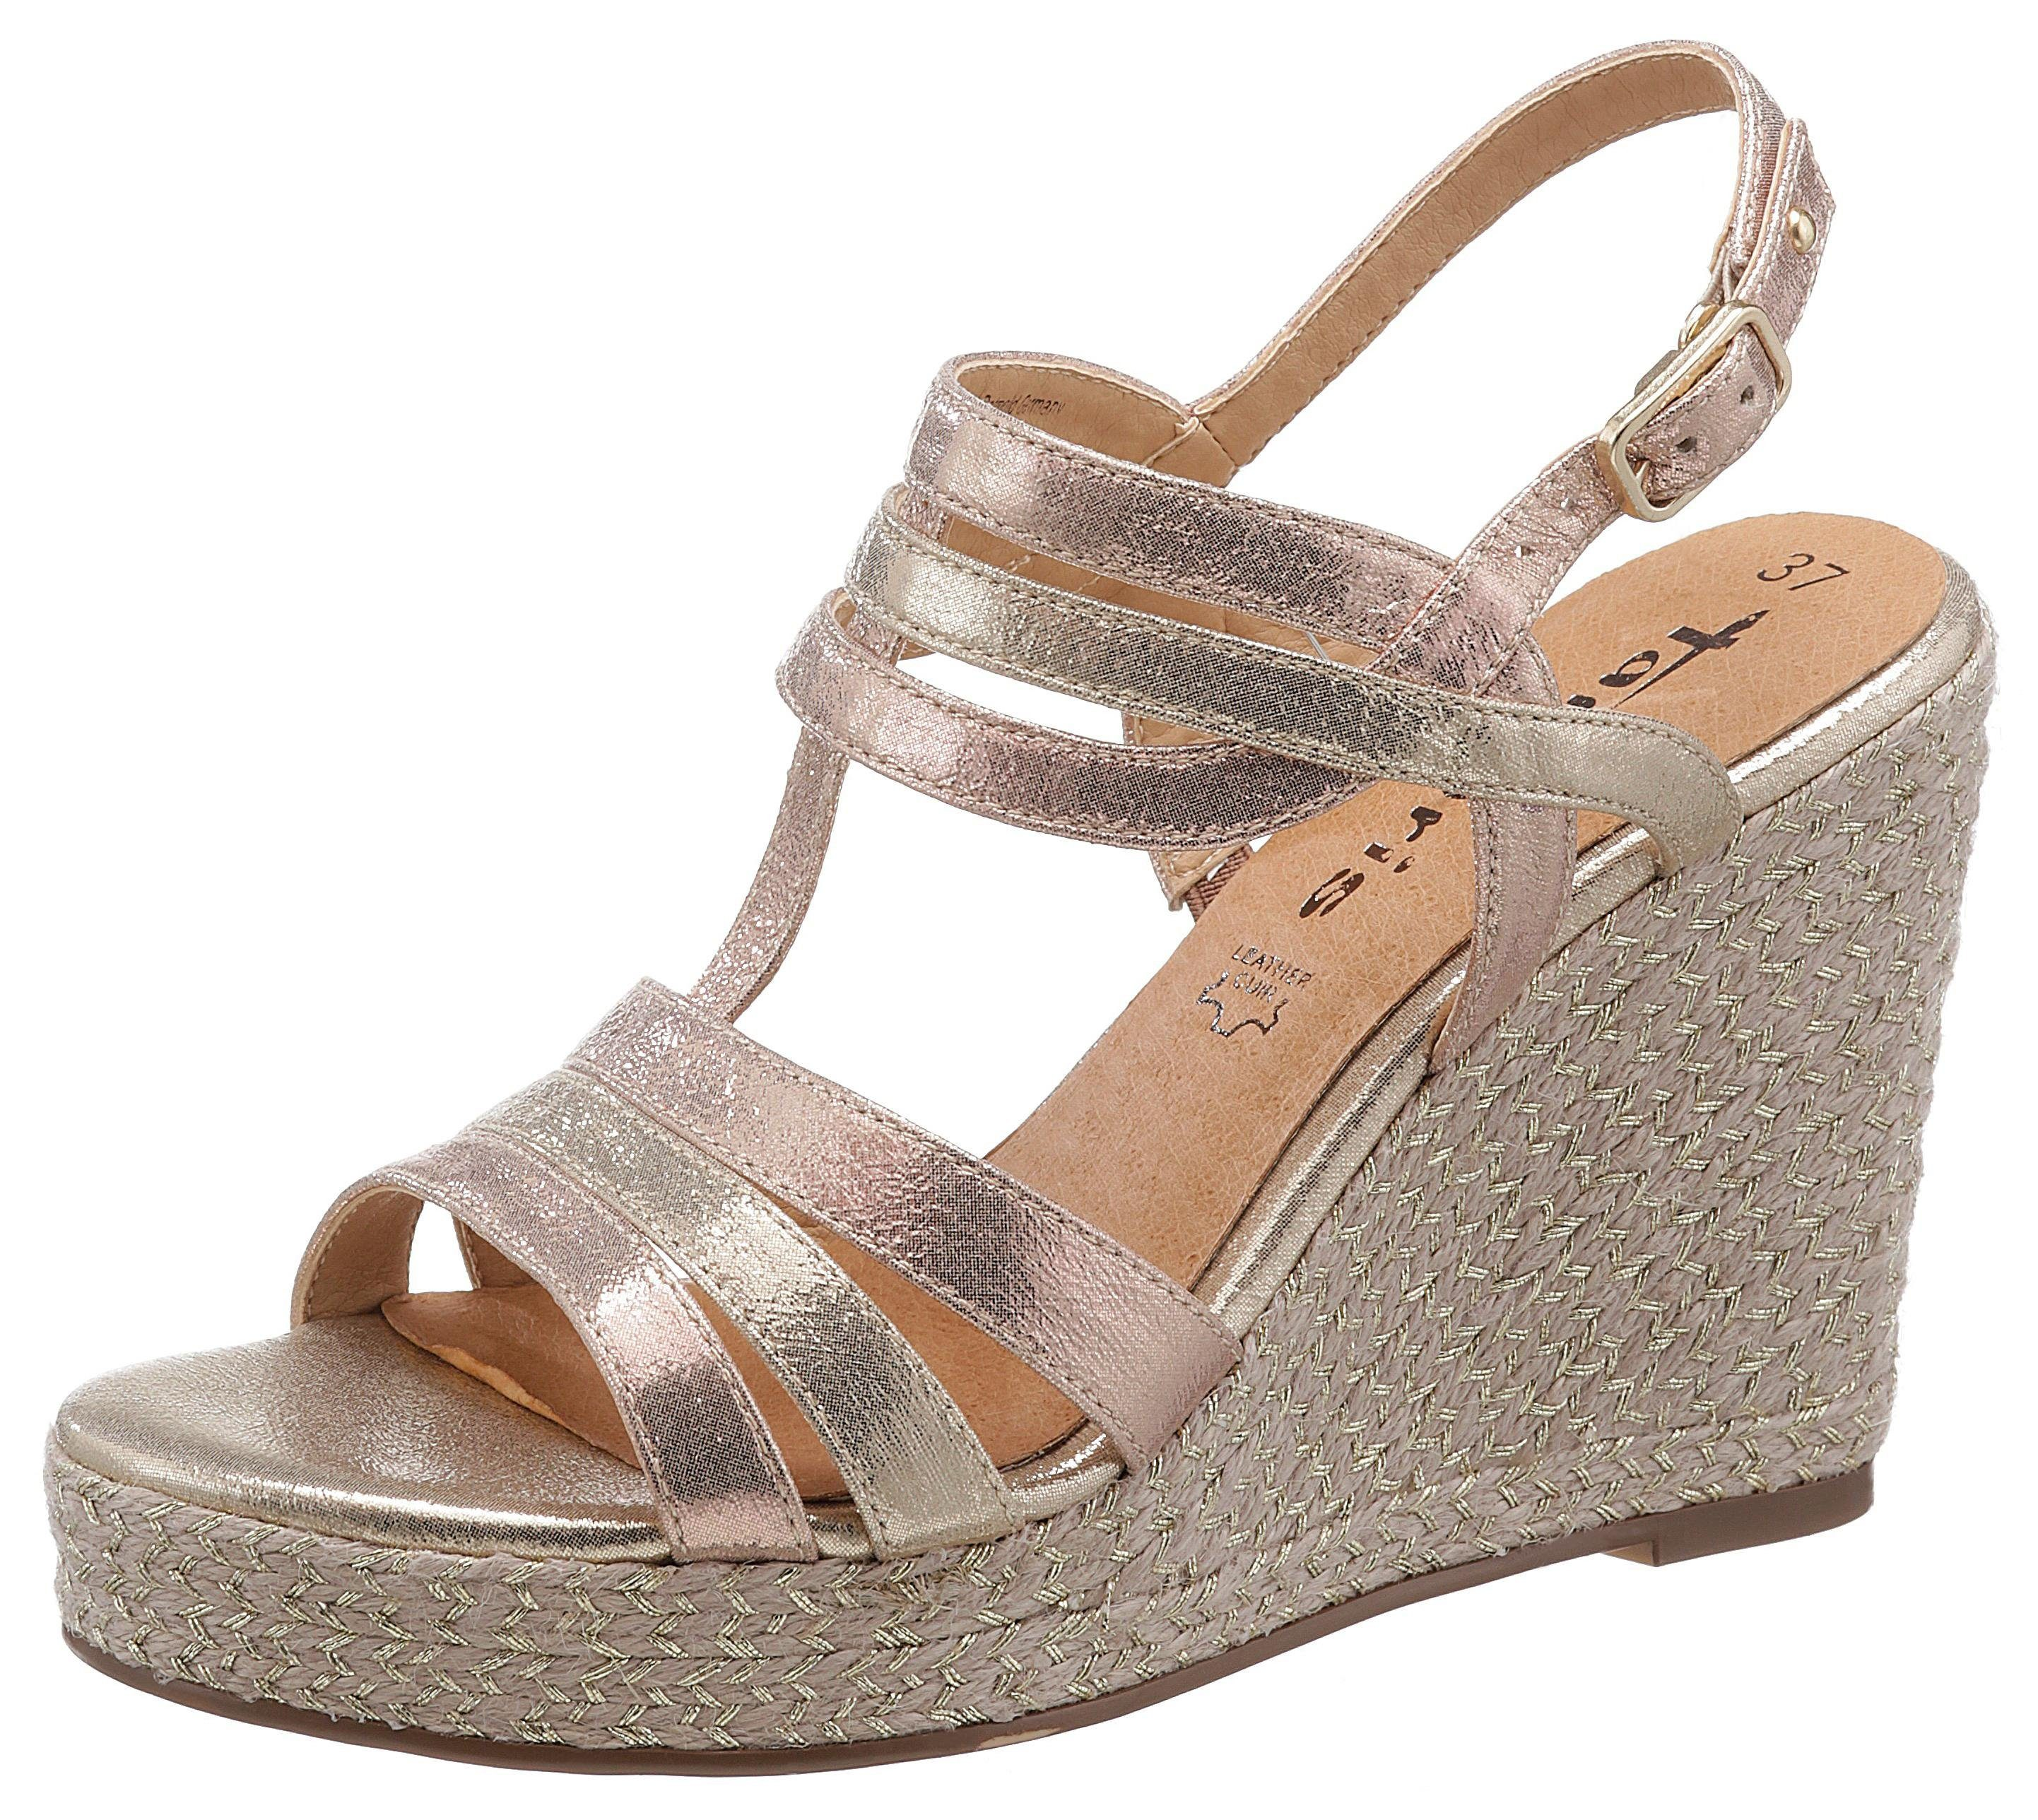 Tamaris »Cynara« Sandalette mit glitzerndem Jute-Bezug